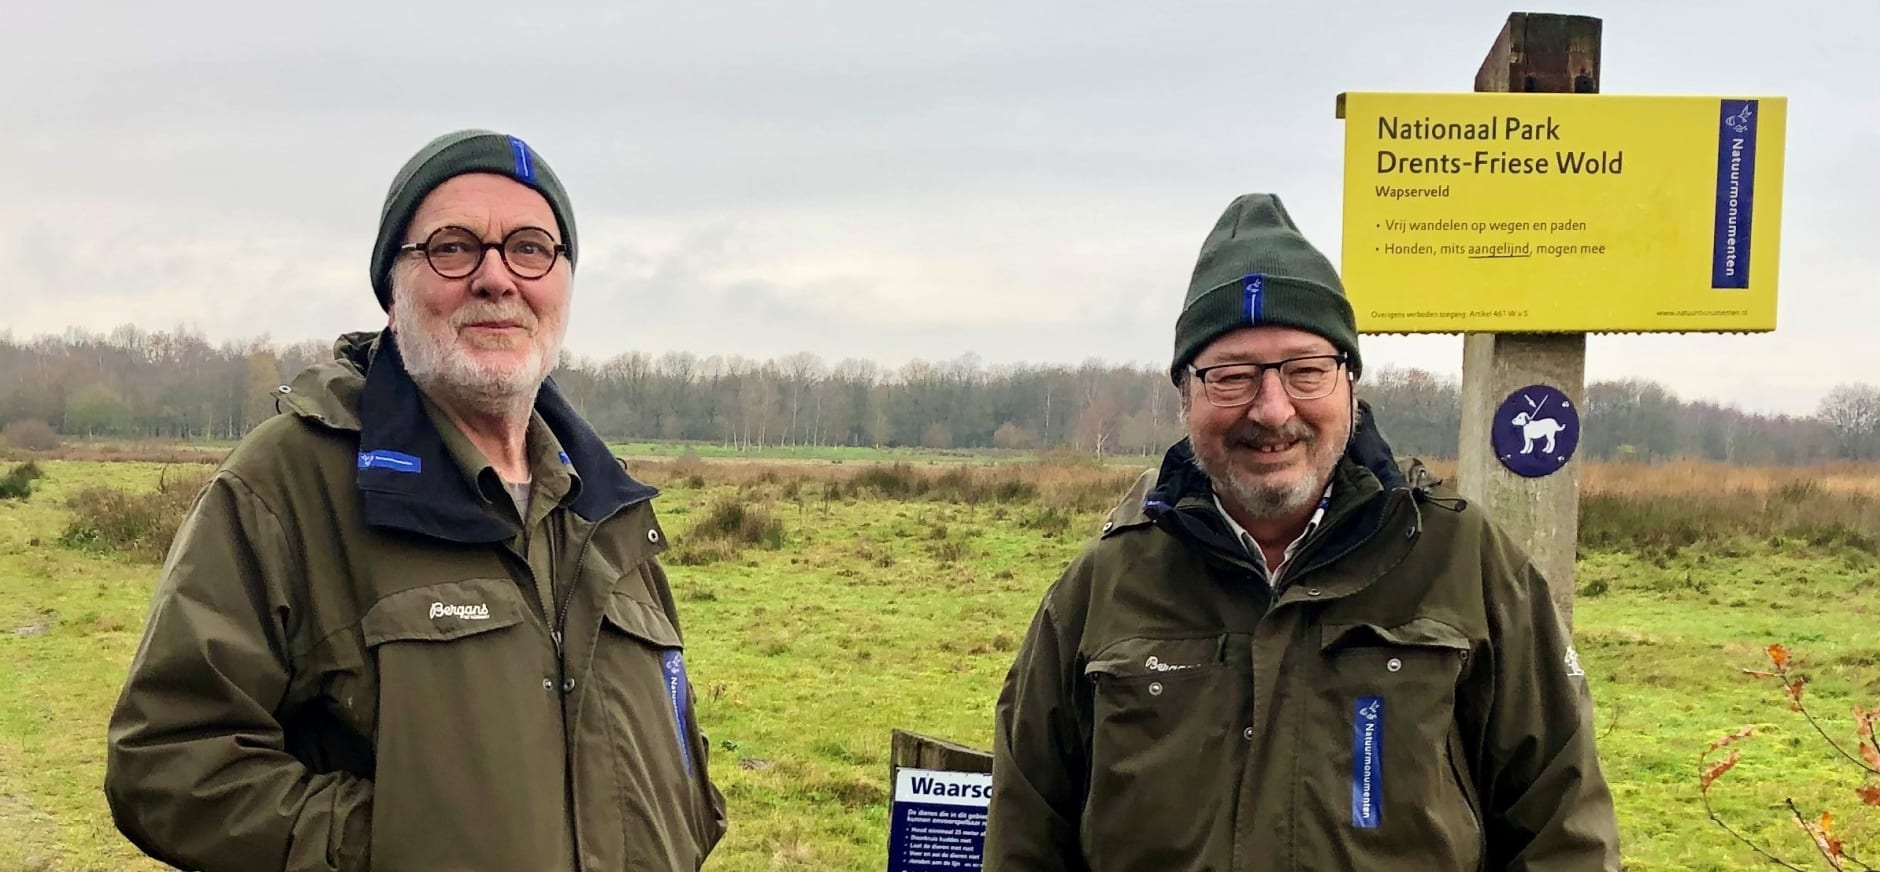 vrijwillige boswachters